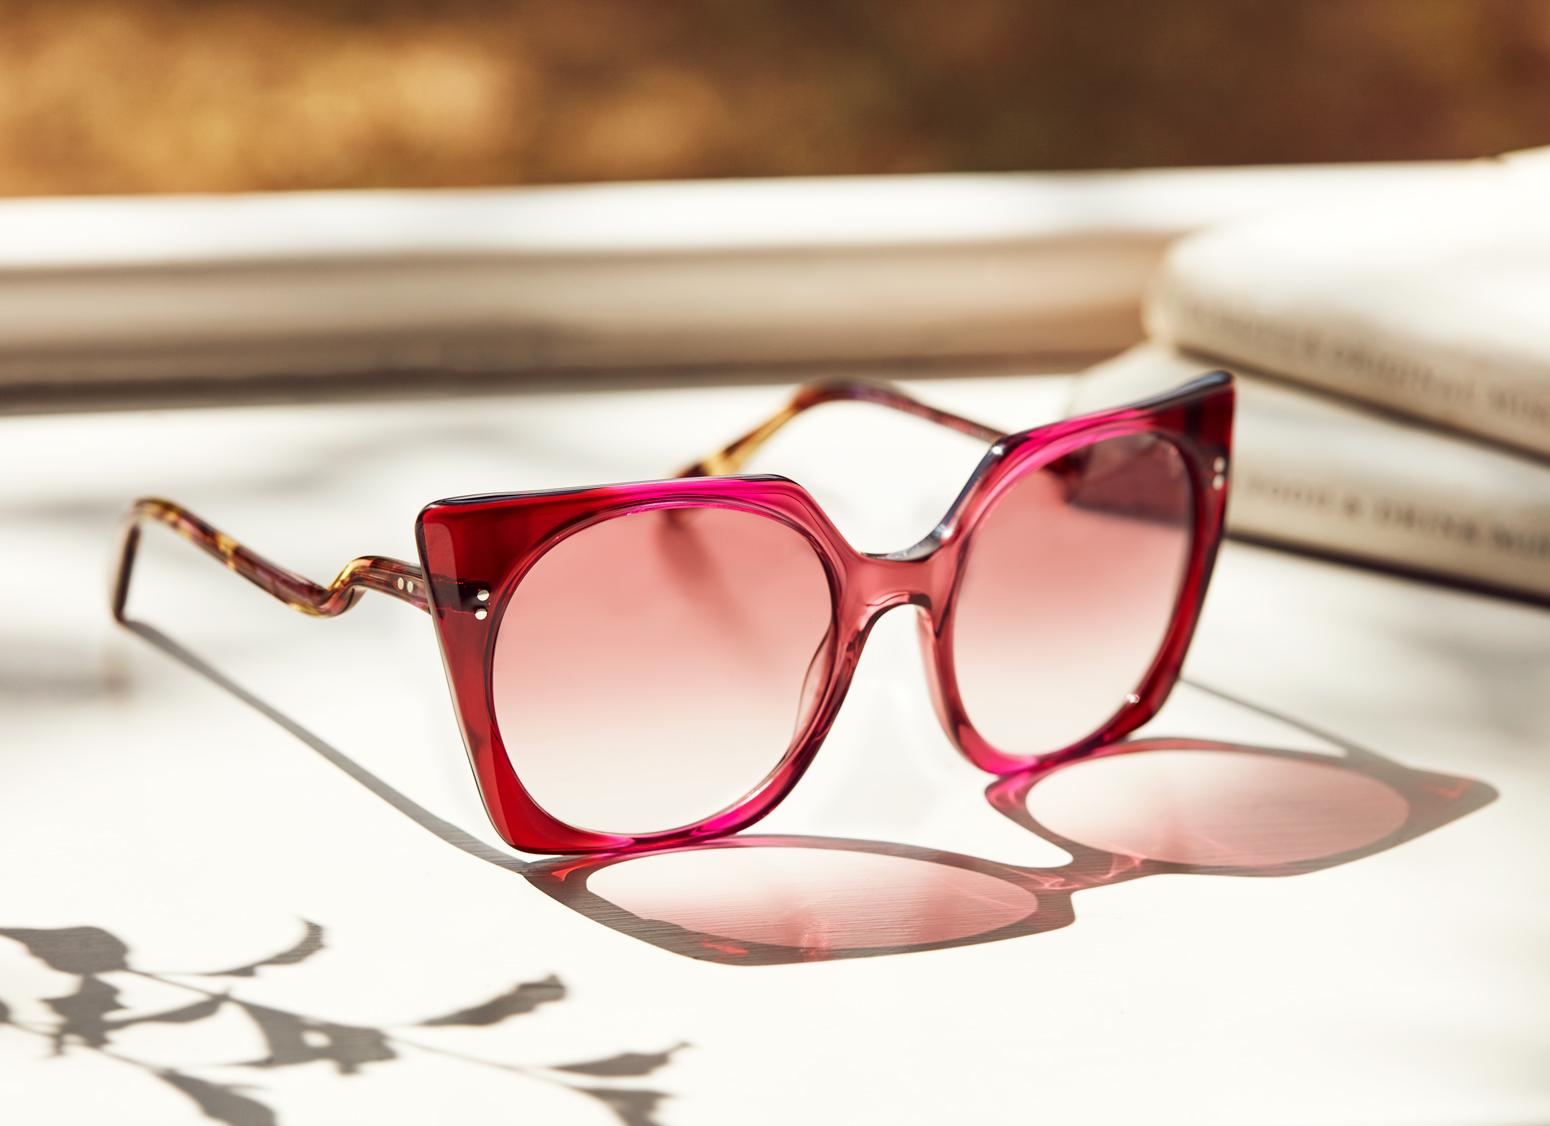 womens walter and herbert sunglasses lifestyle still life kirsty owen